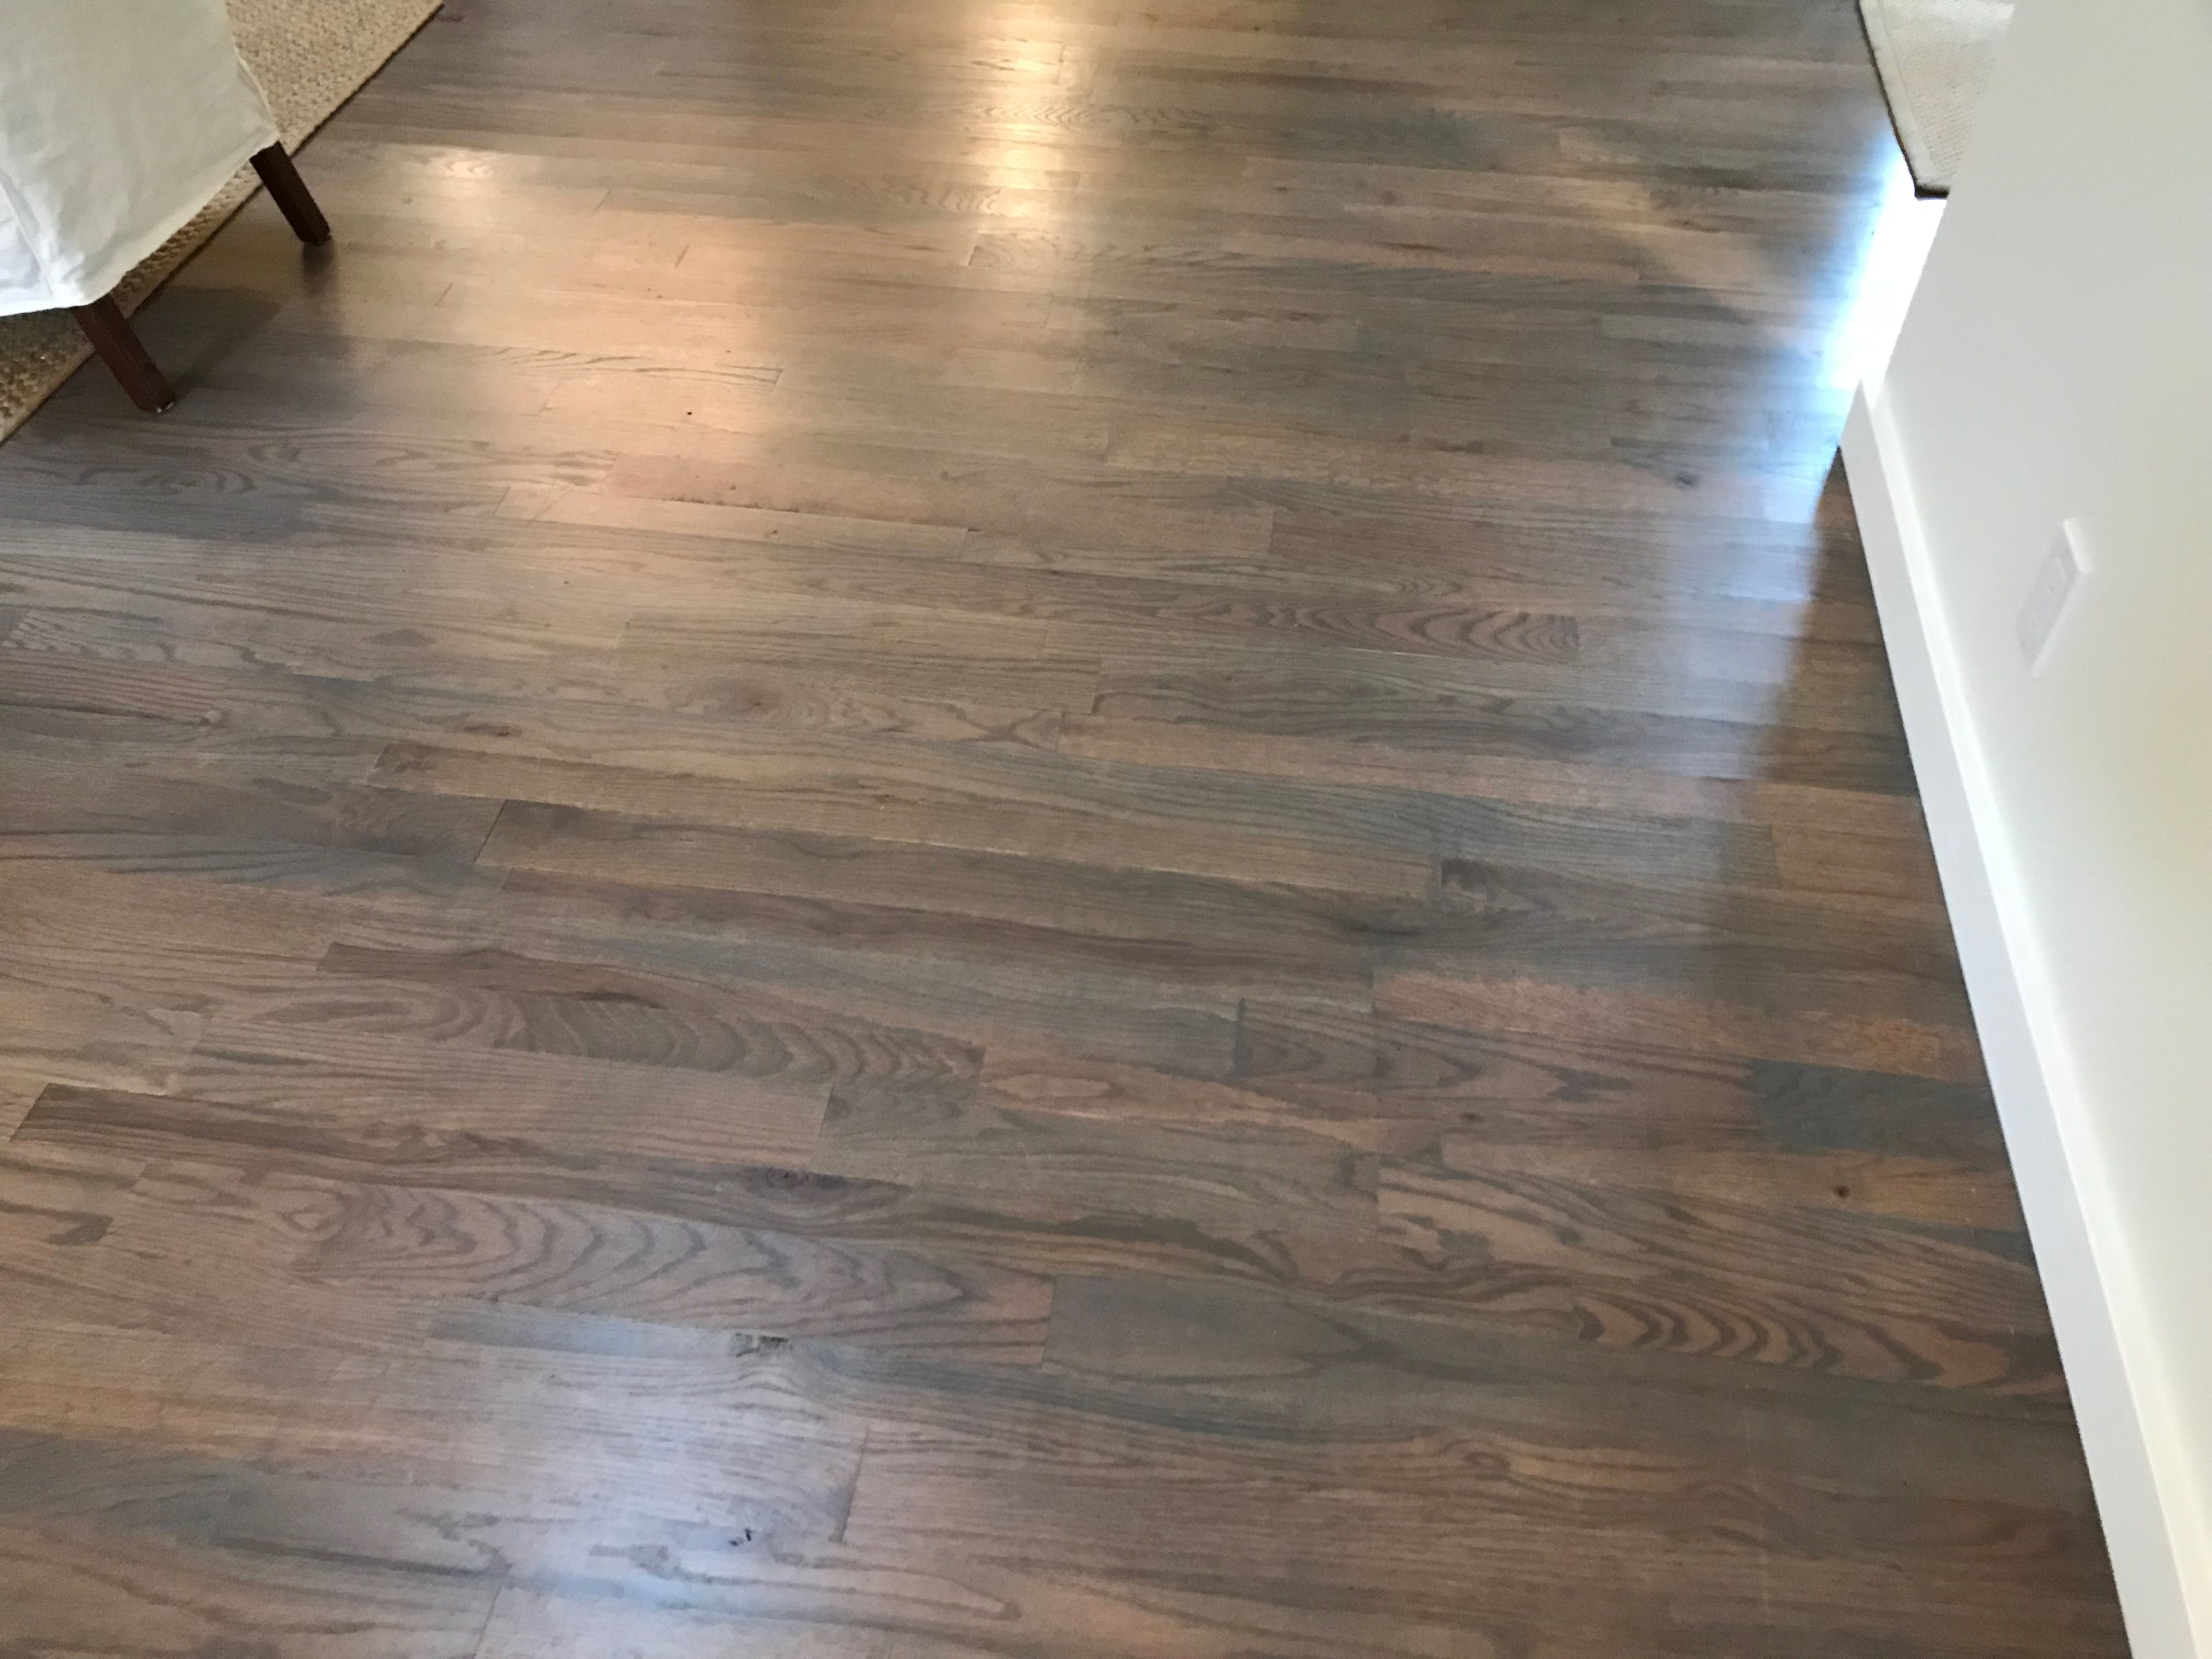 Pin by Debra Romas on flooring Flooring, Hardwood